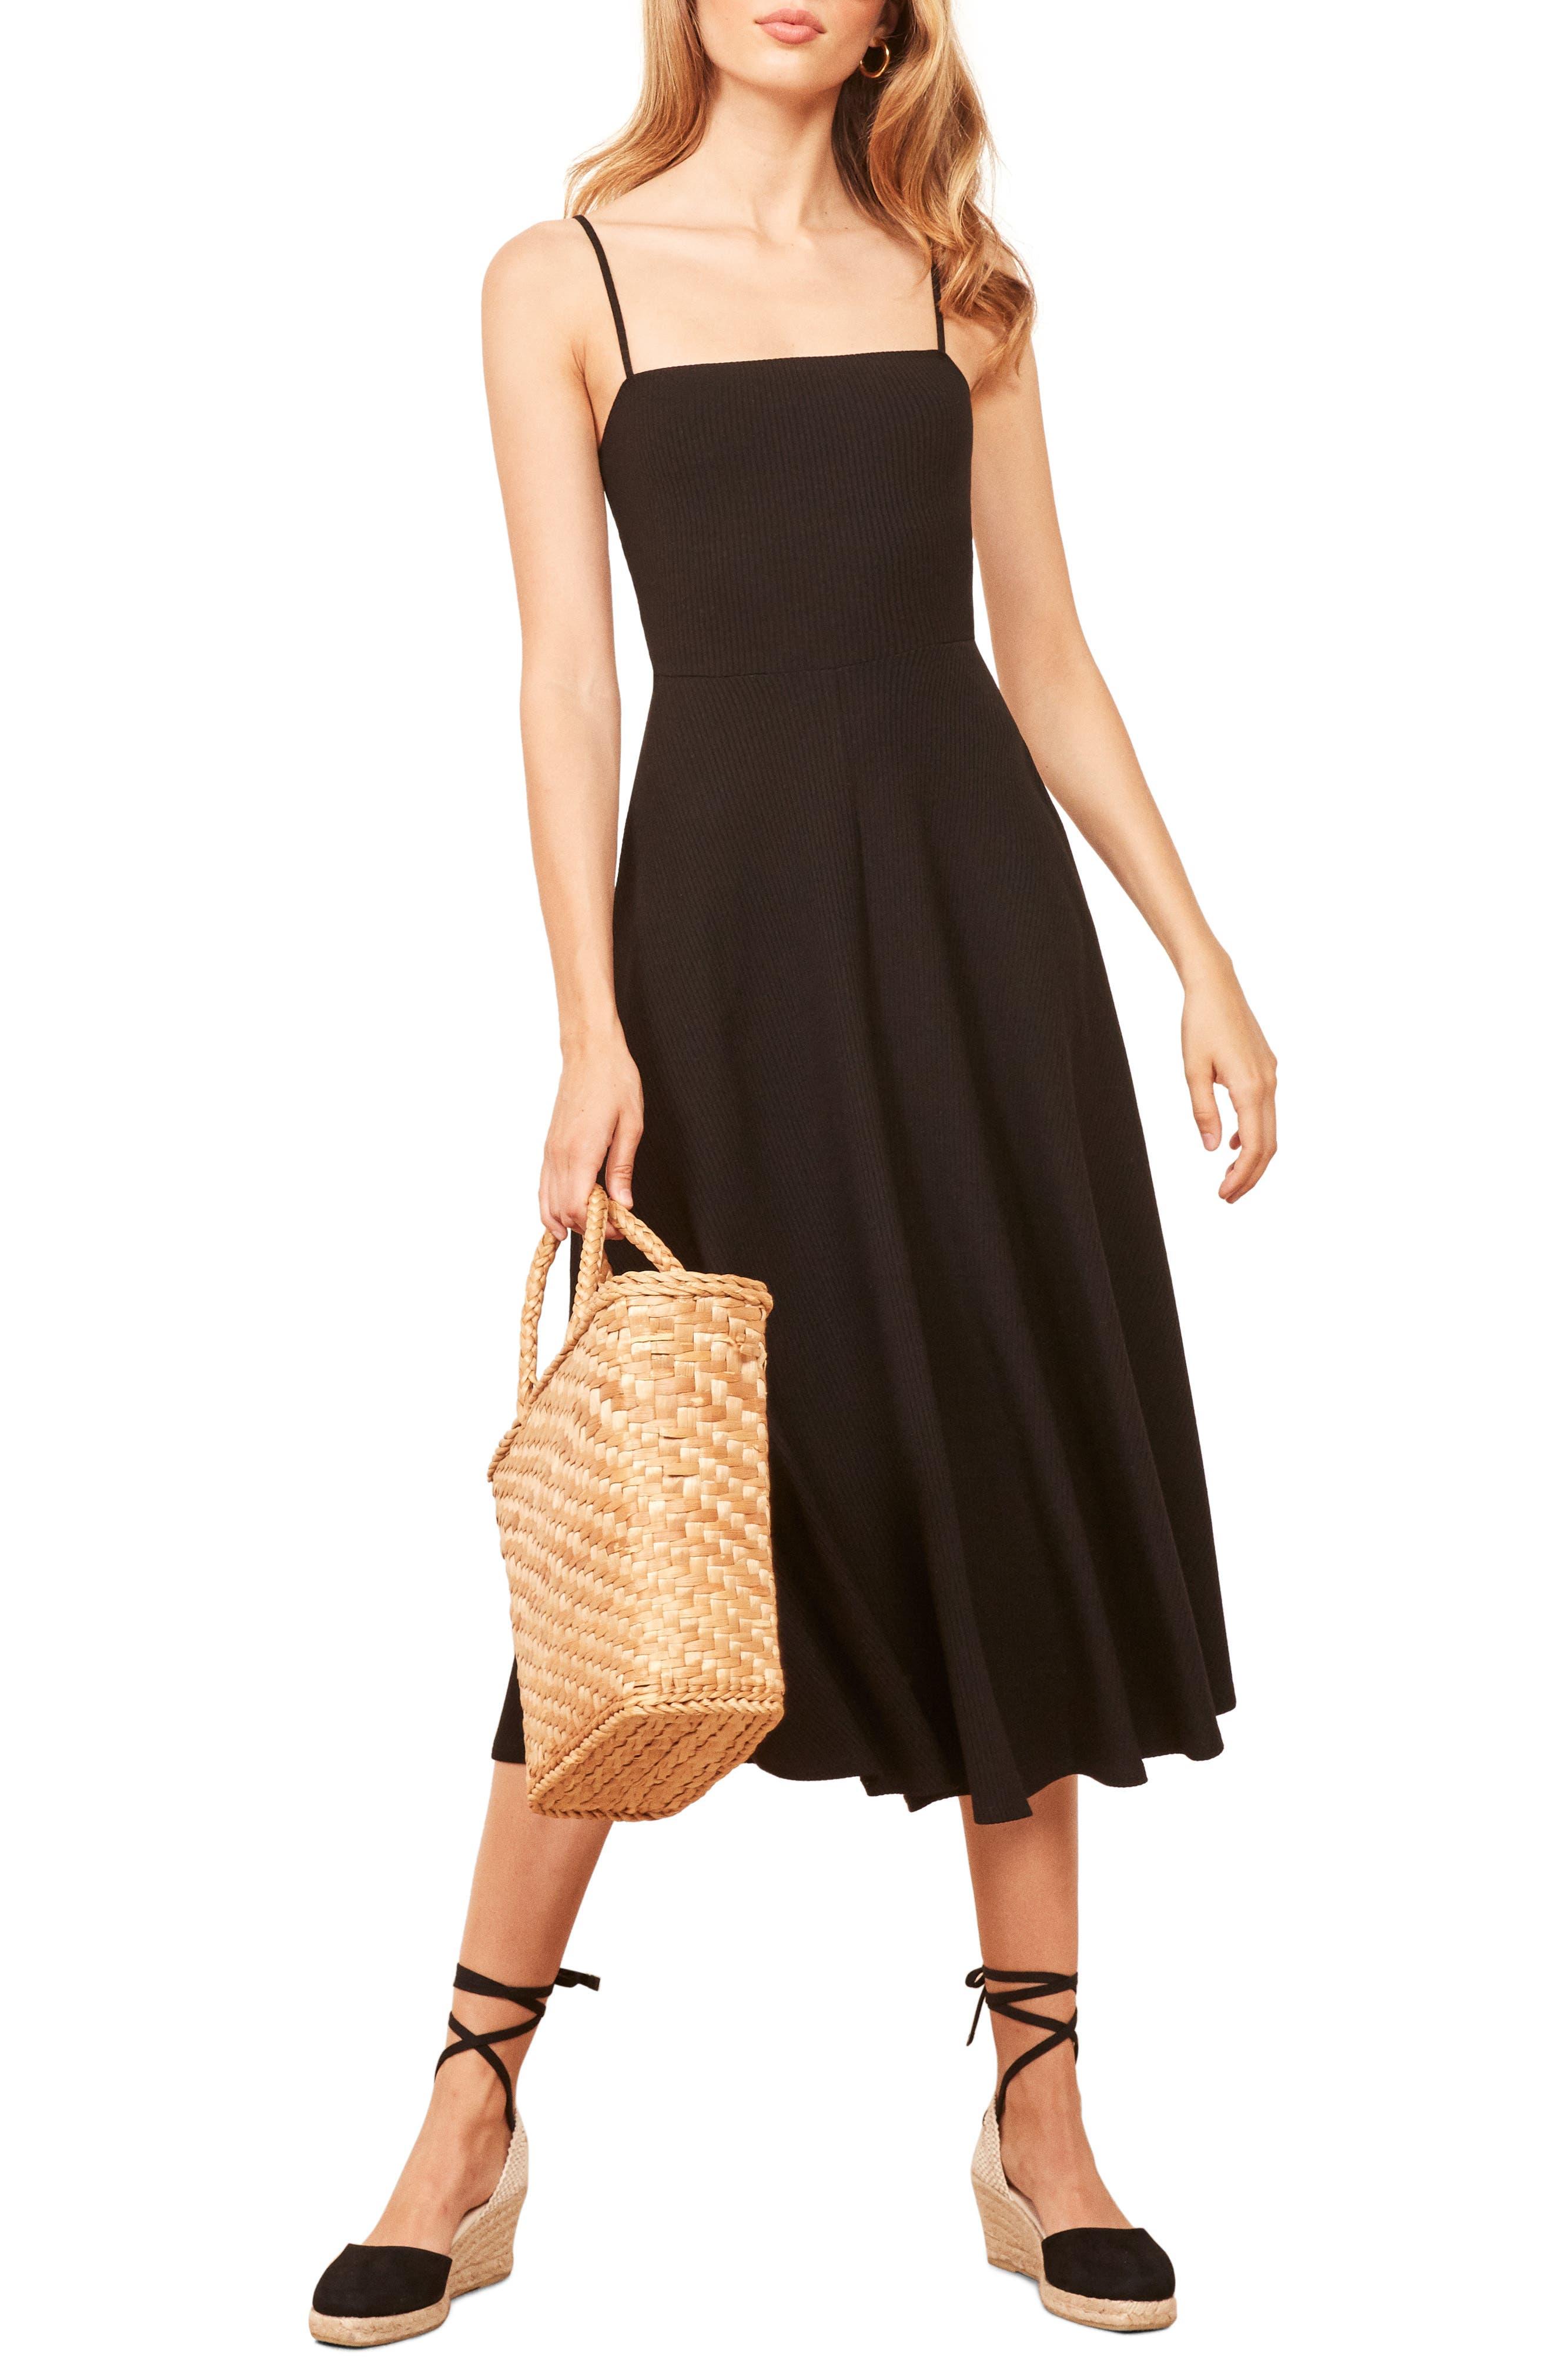 REFORMATION Bettie Dress, Main, color, 001